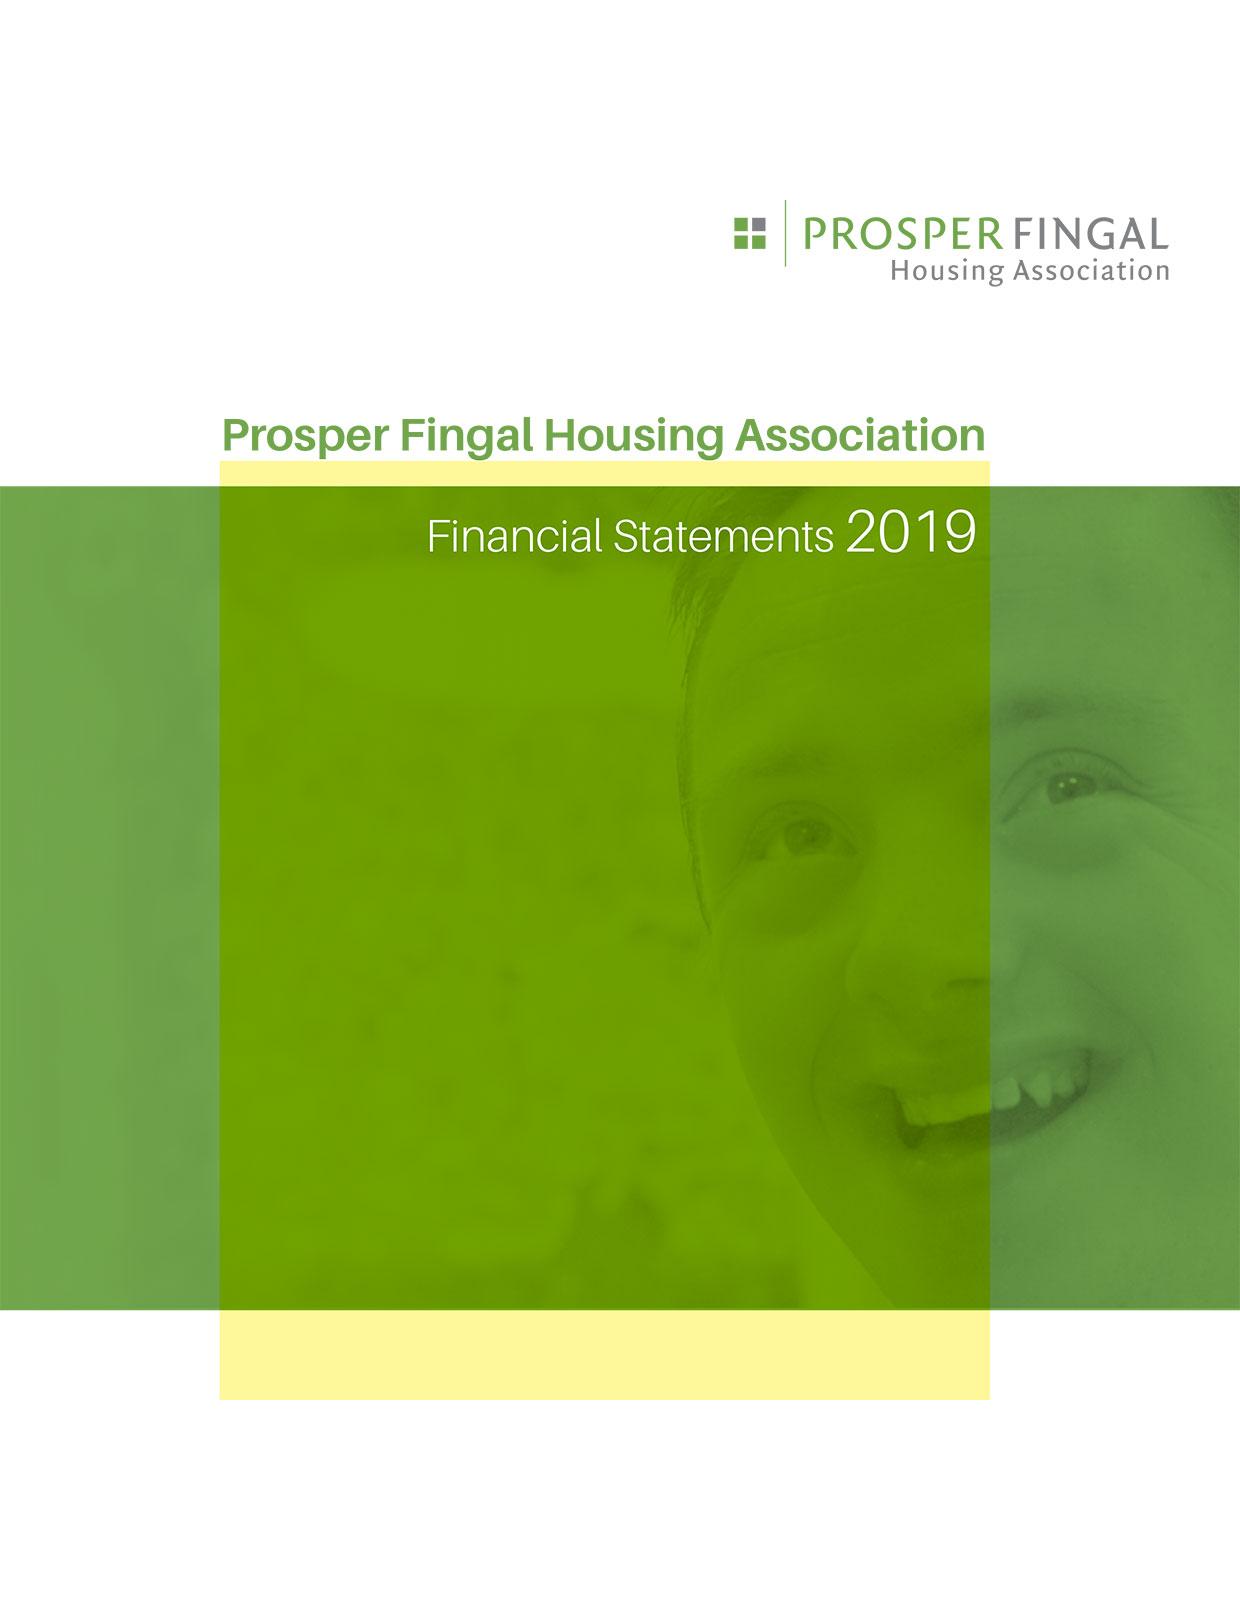 Prosper Fingal Housing Association Financial Statements 2019